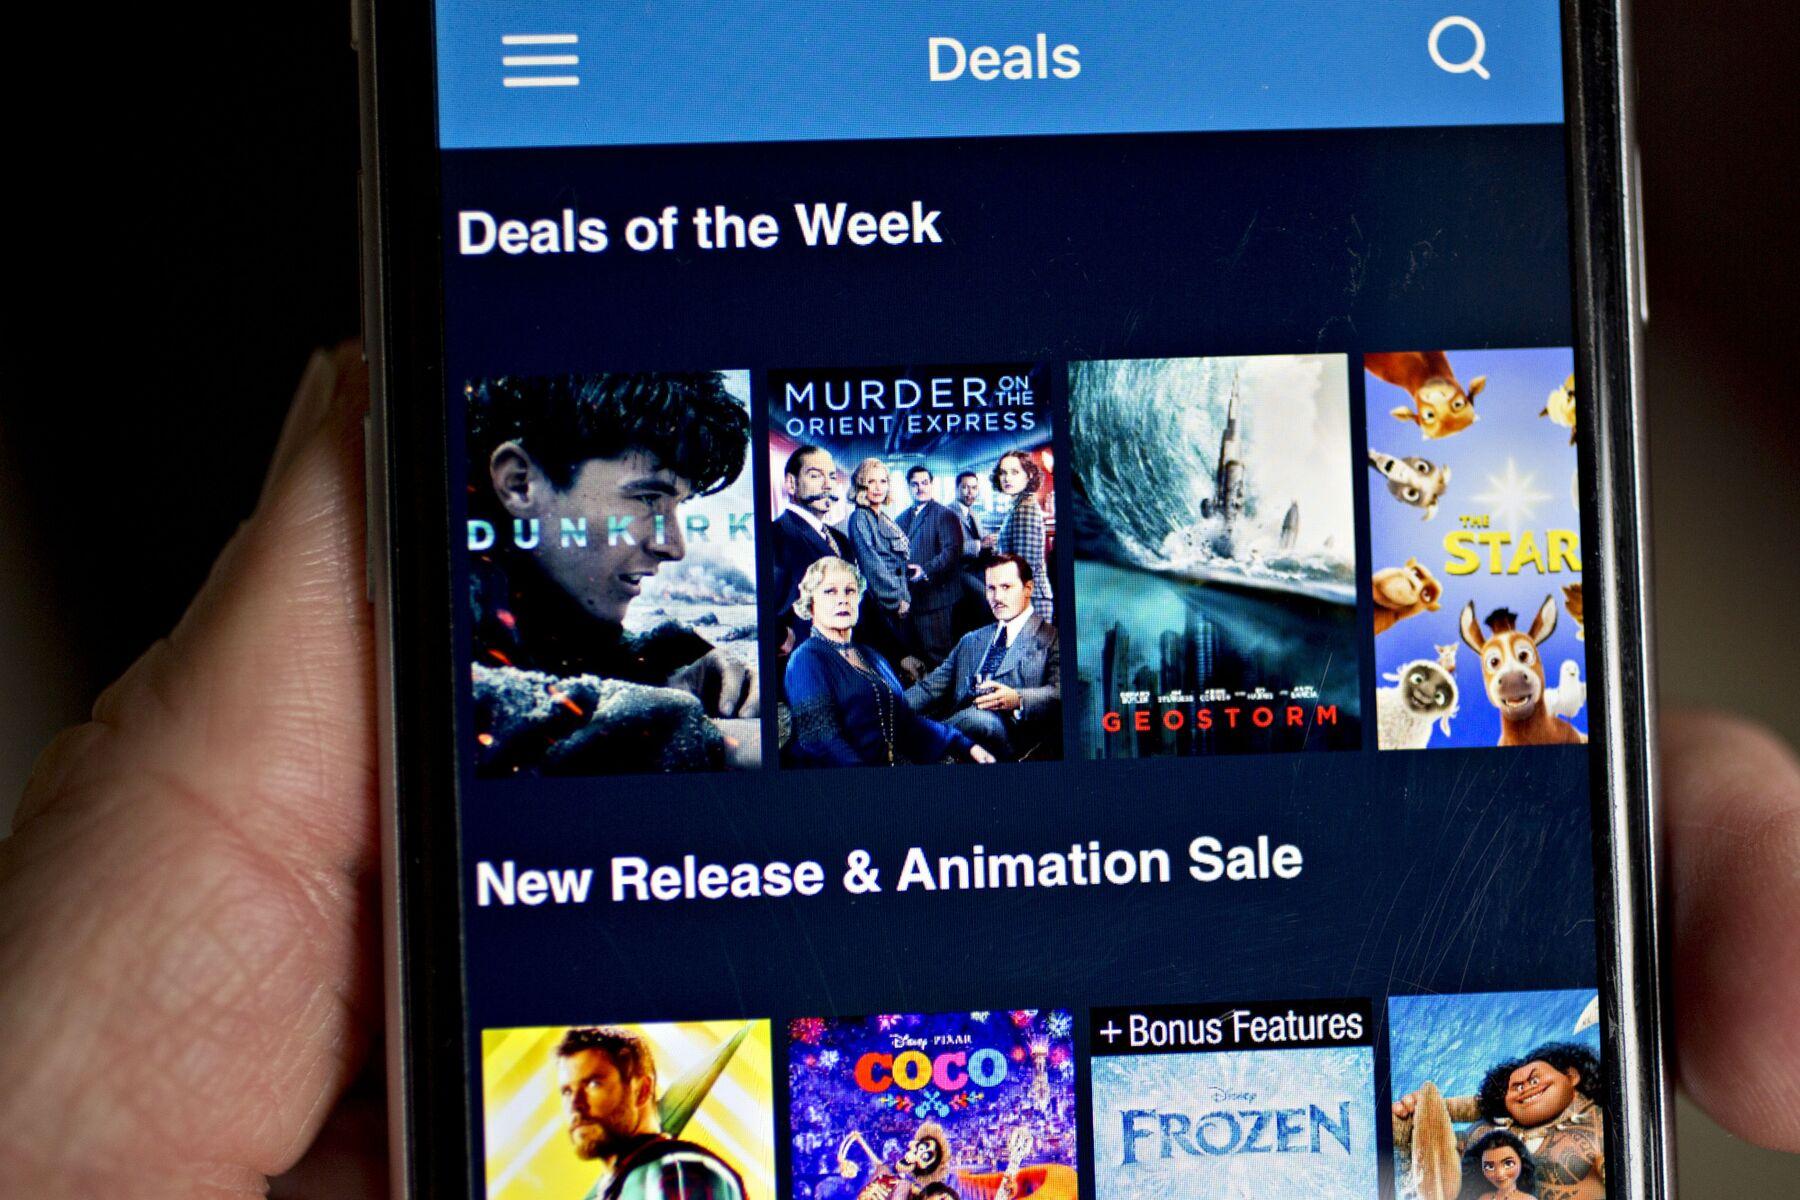 Walmart's Vudu streaming platform